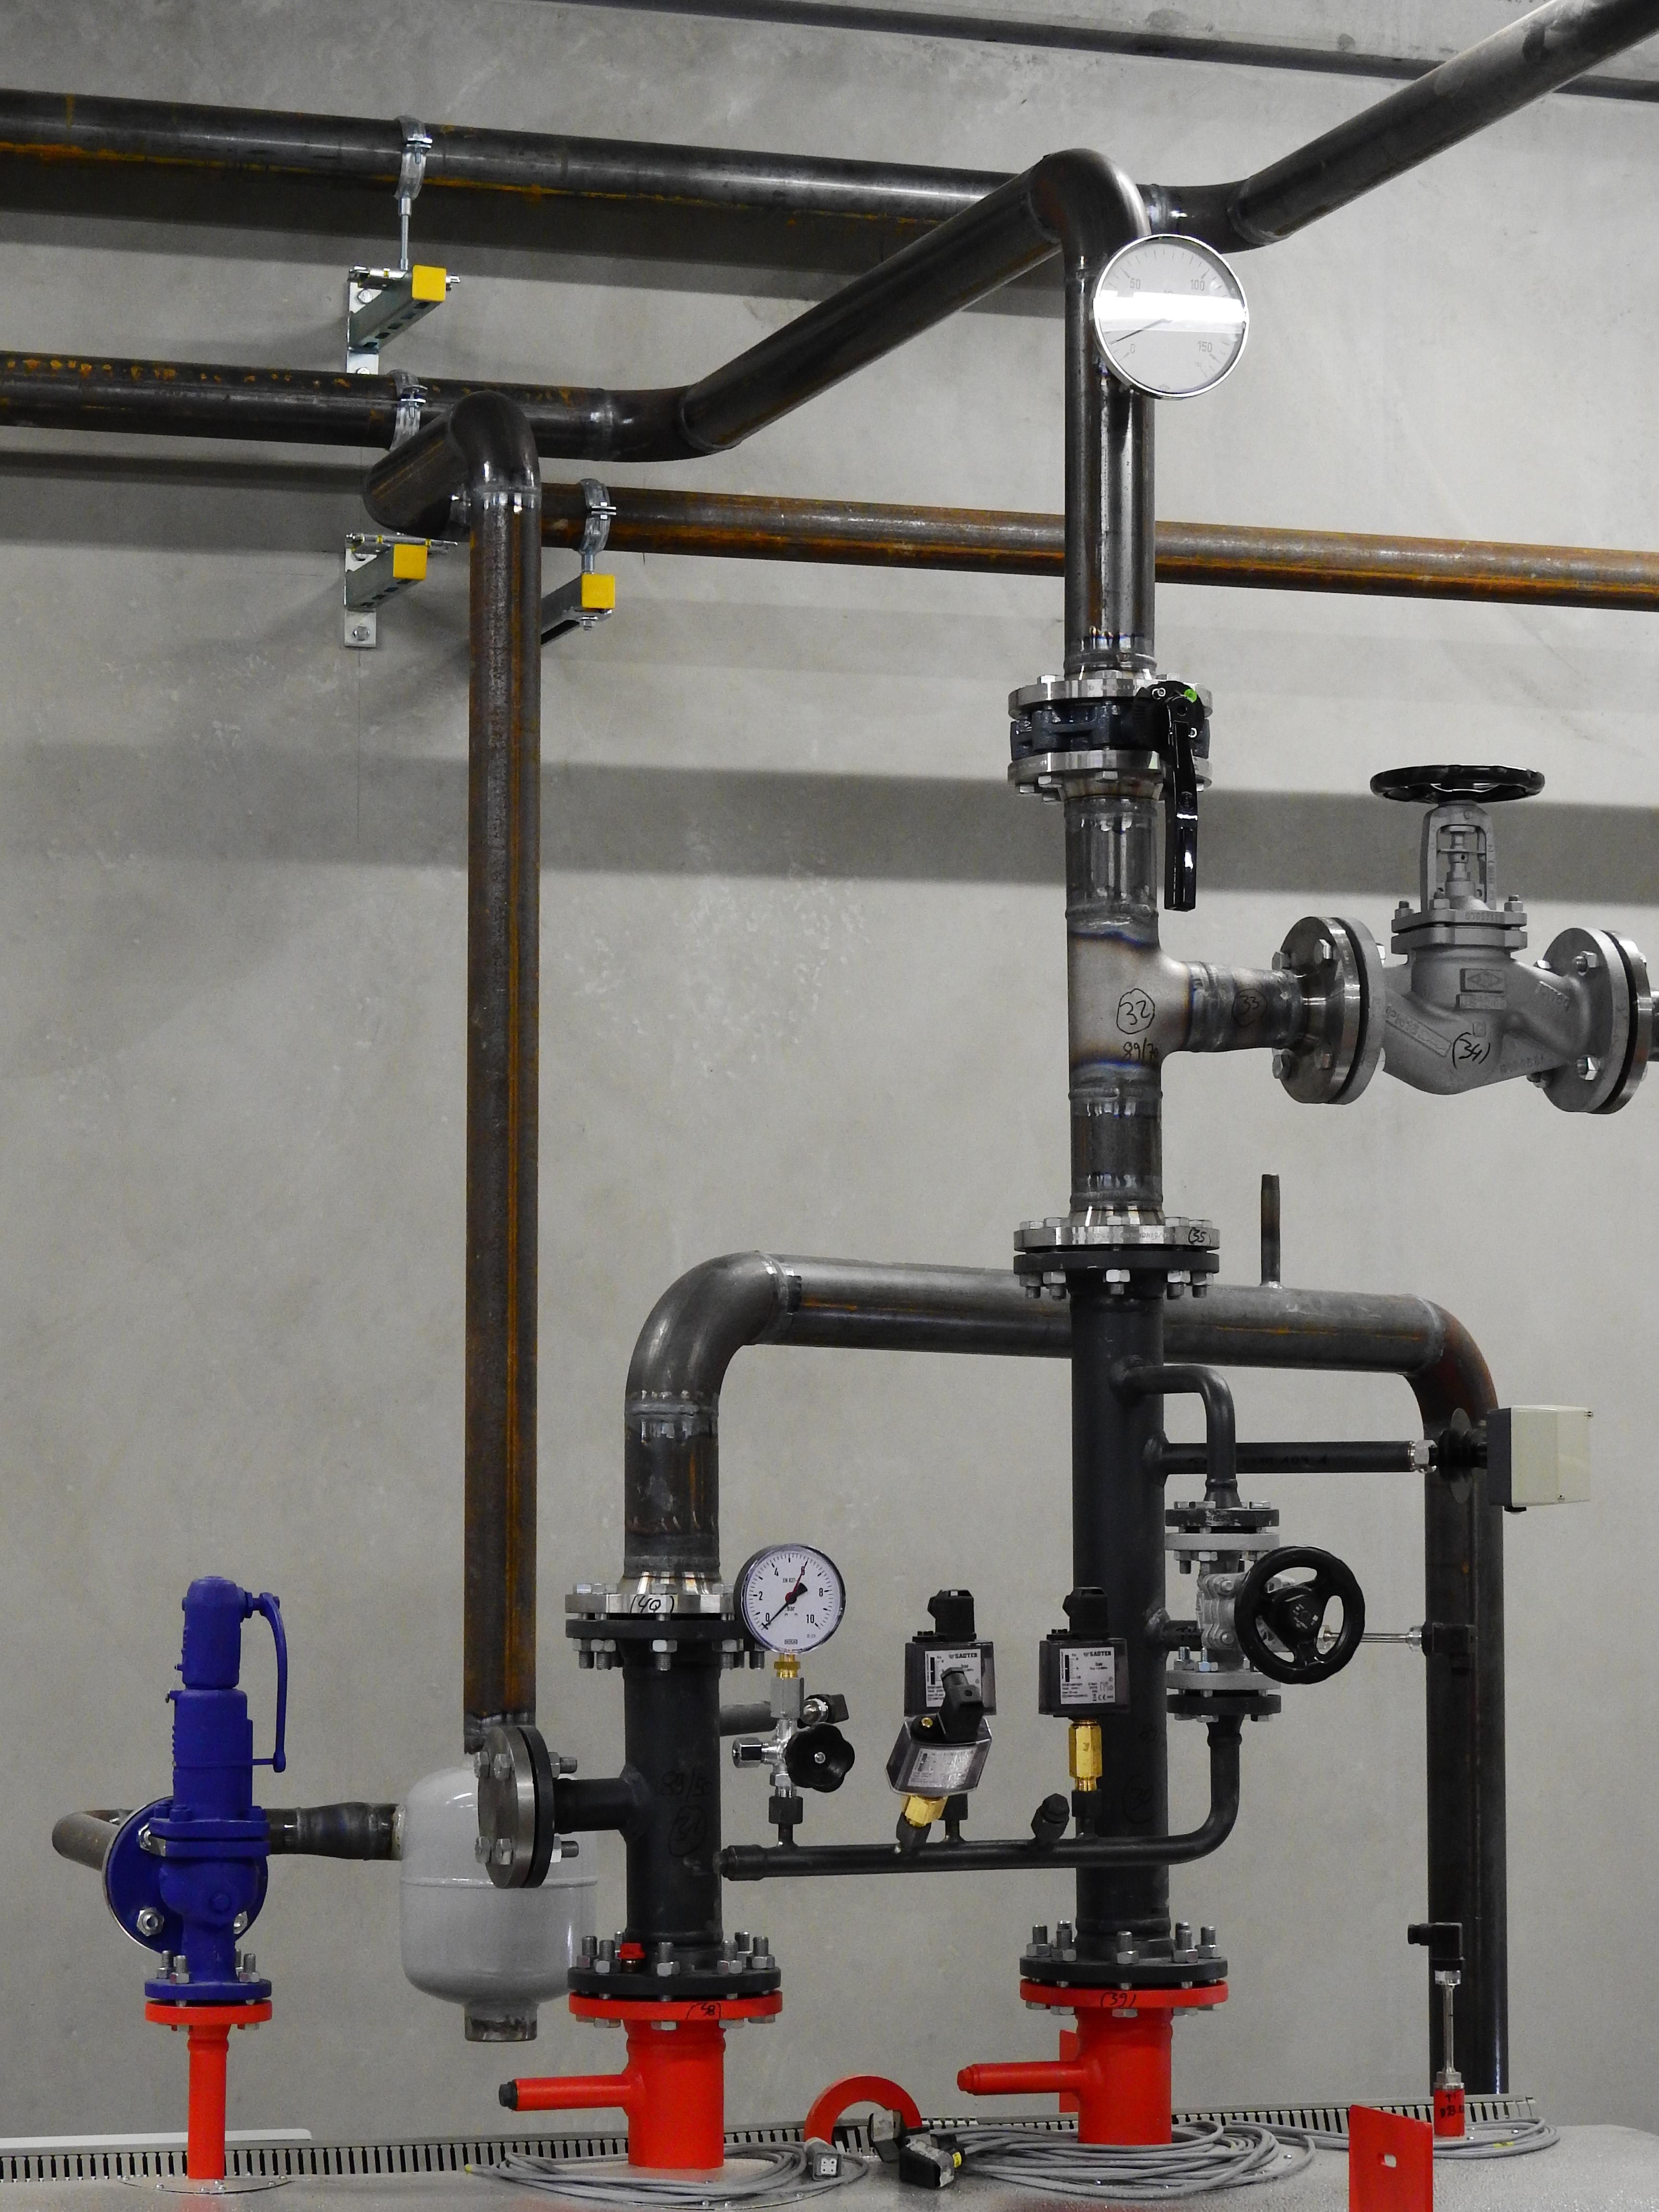 Fotos gratis tecnolog a anuncio m quina industria - Maquina de agua a presion ...